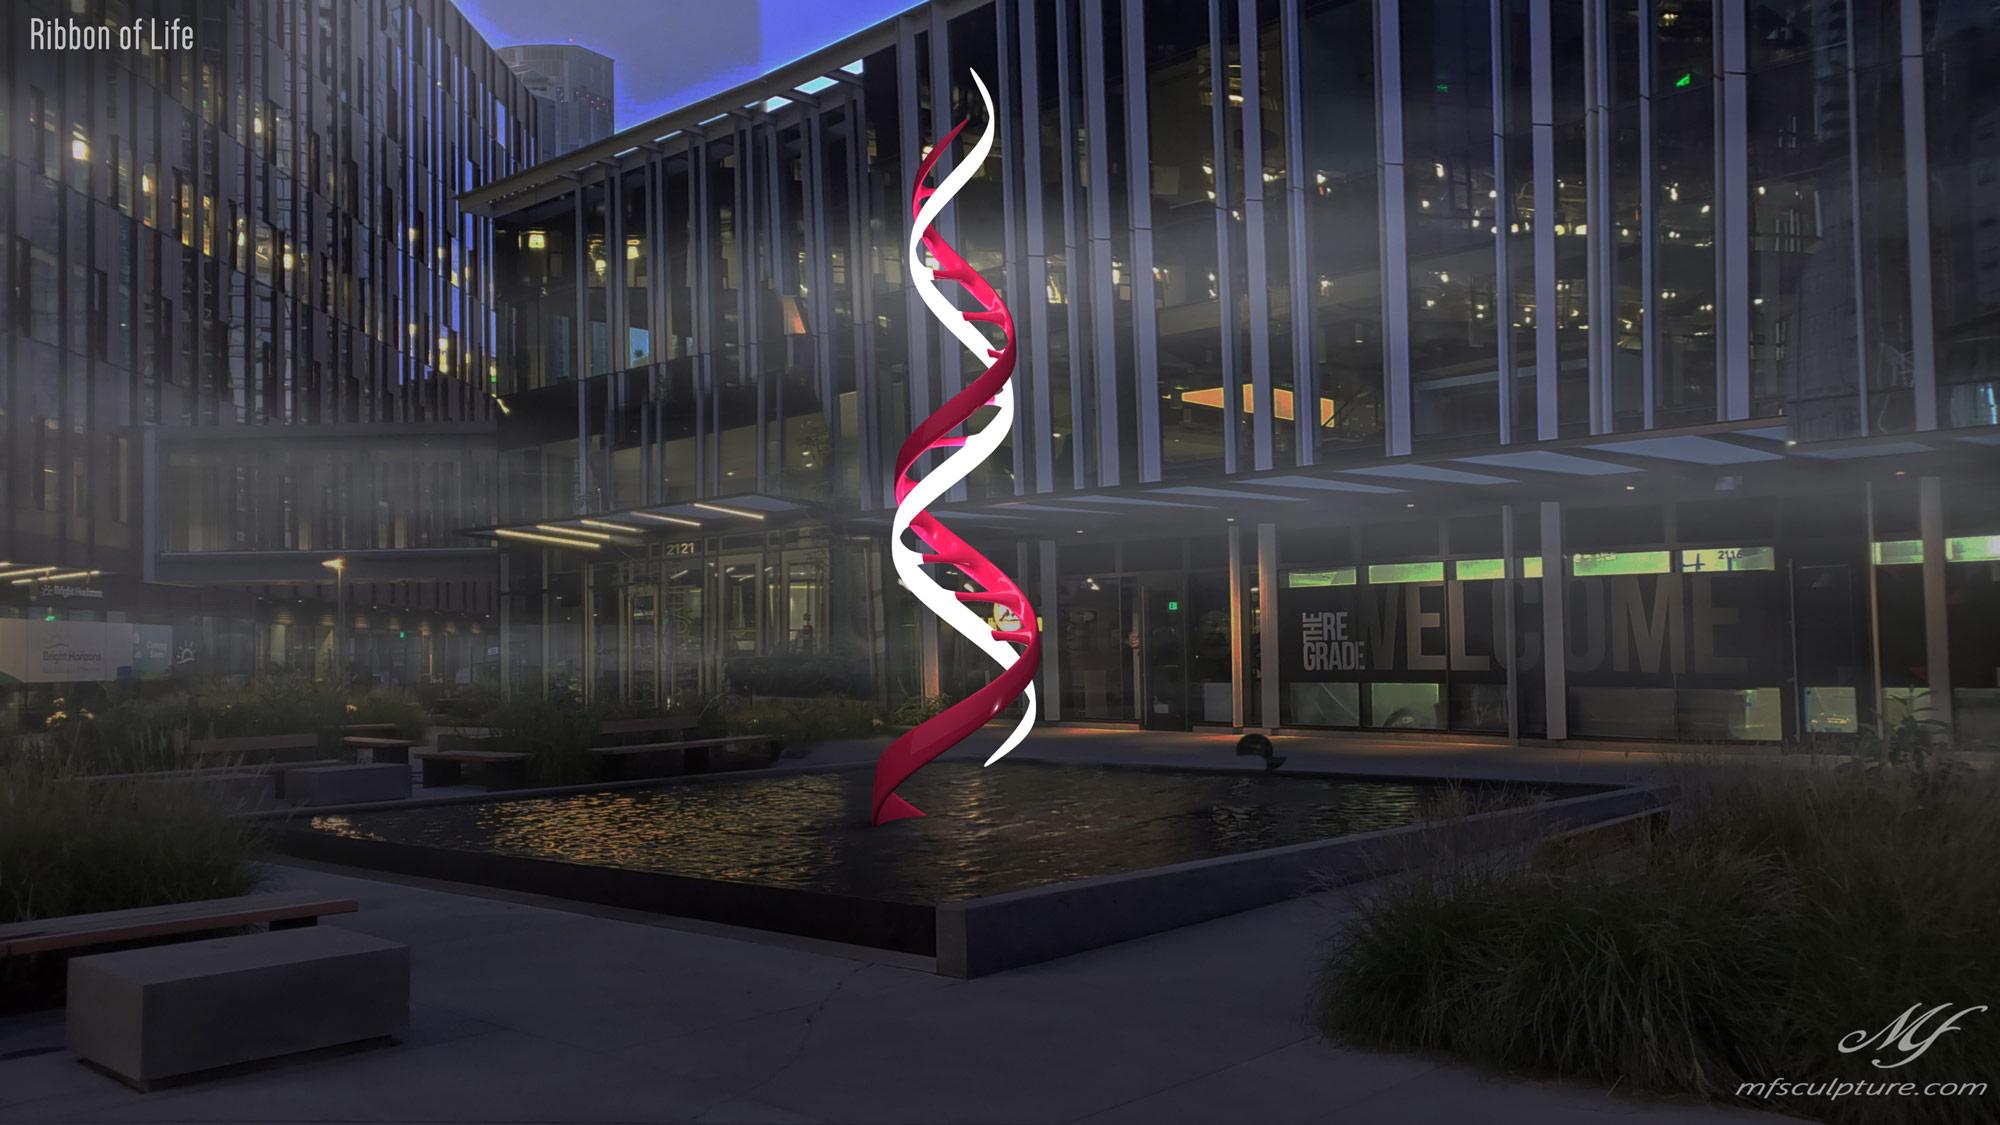 DNA Double Helix Sculpture Contemporary Biology 7